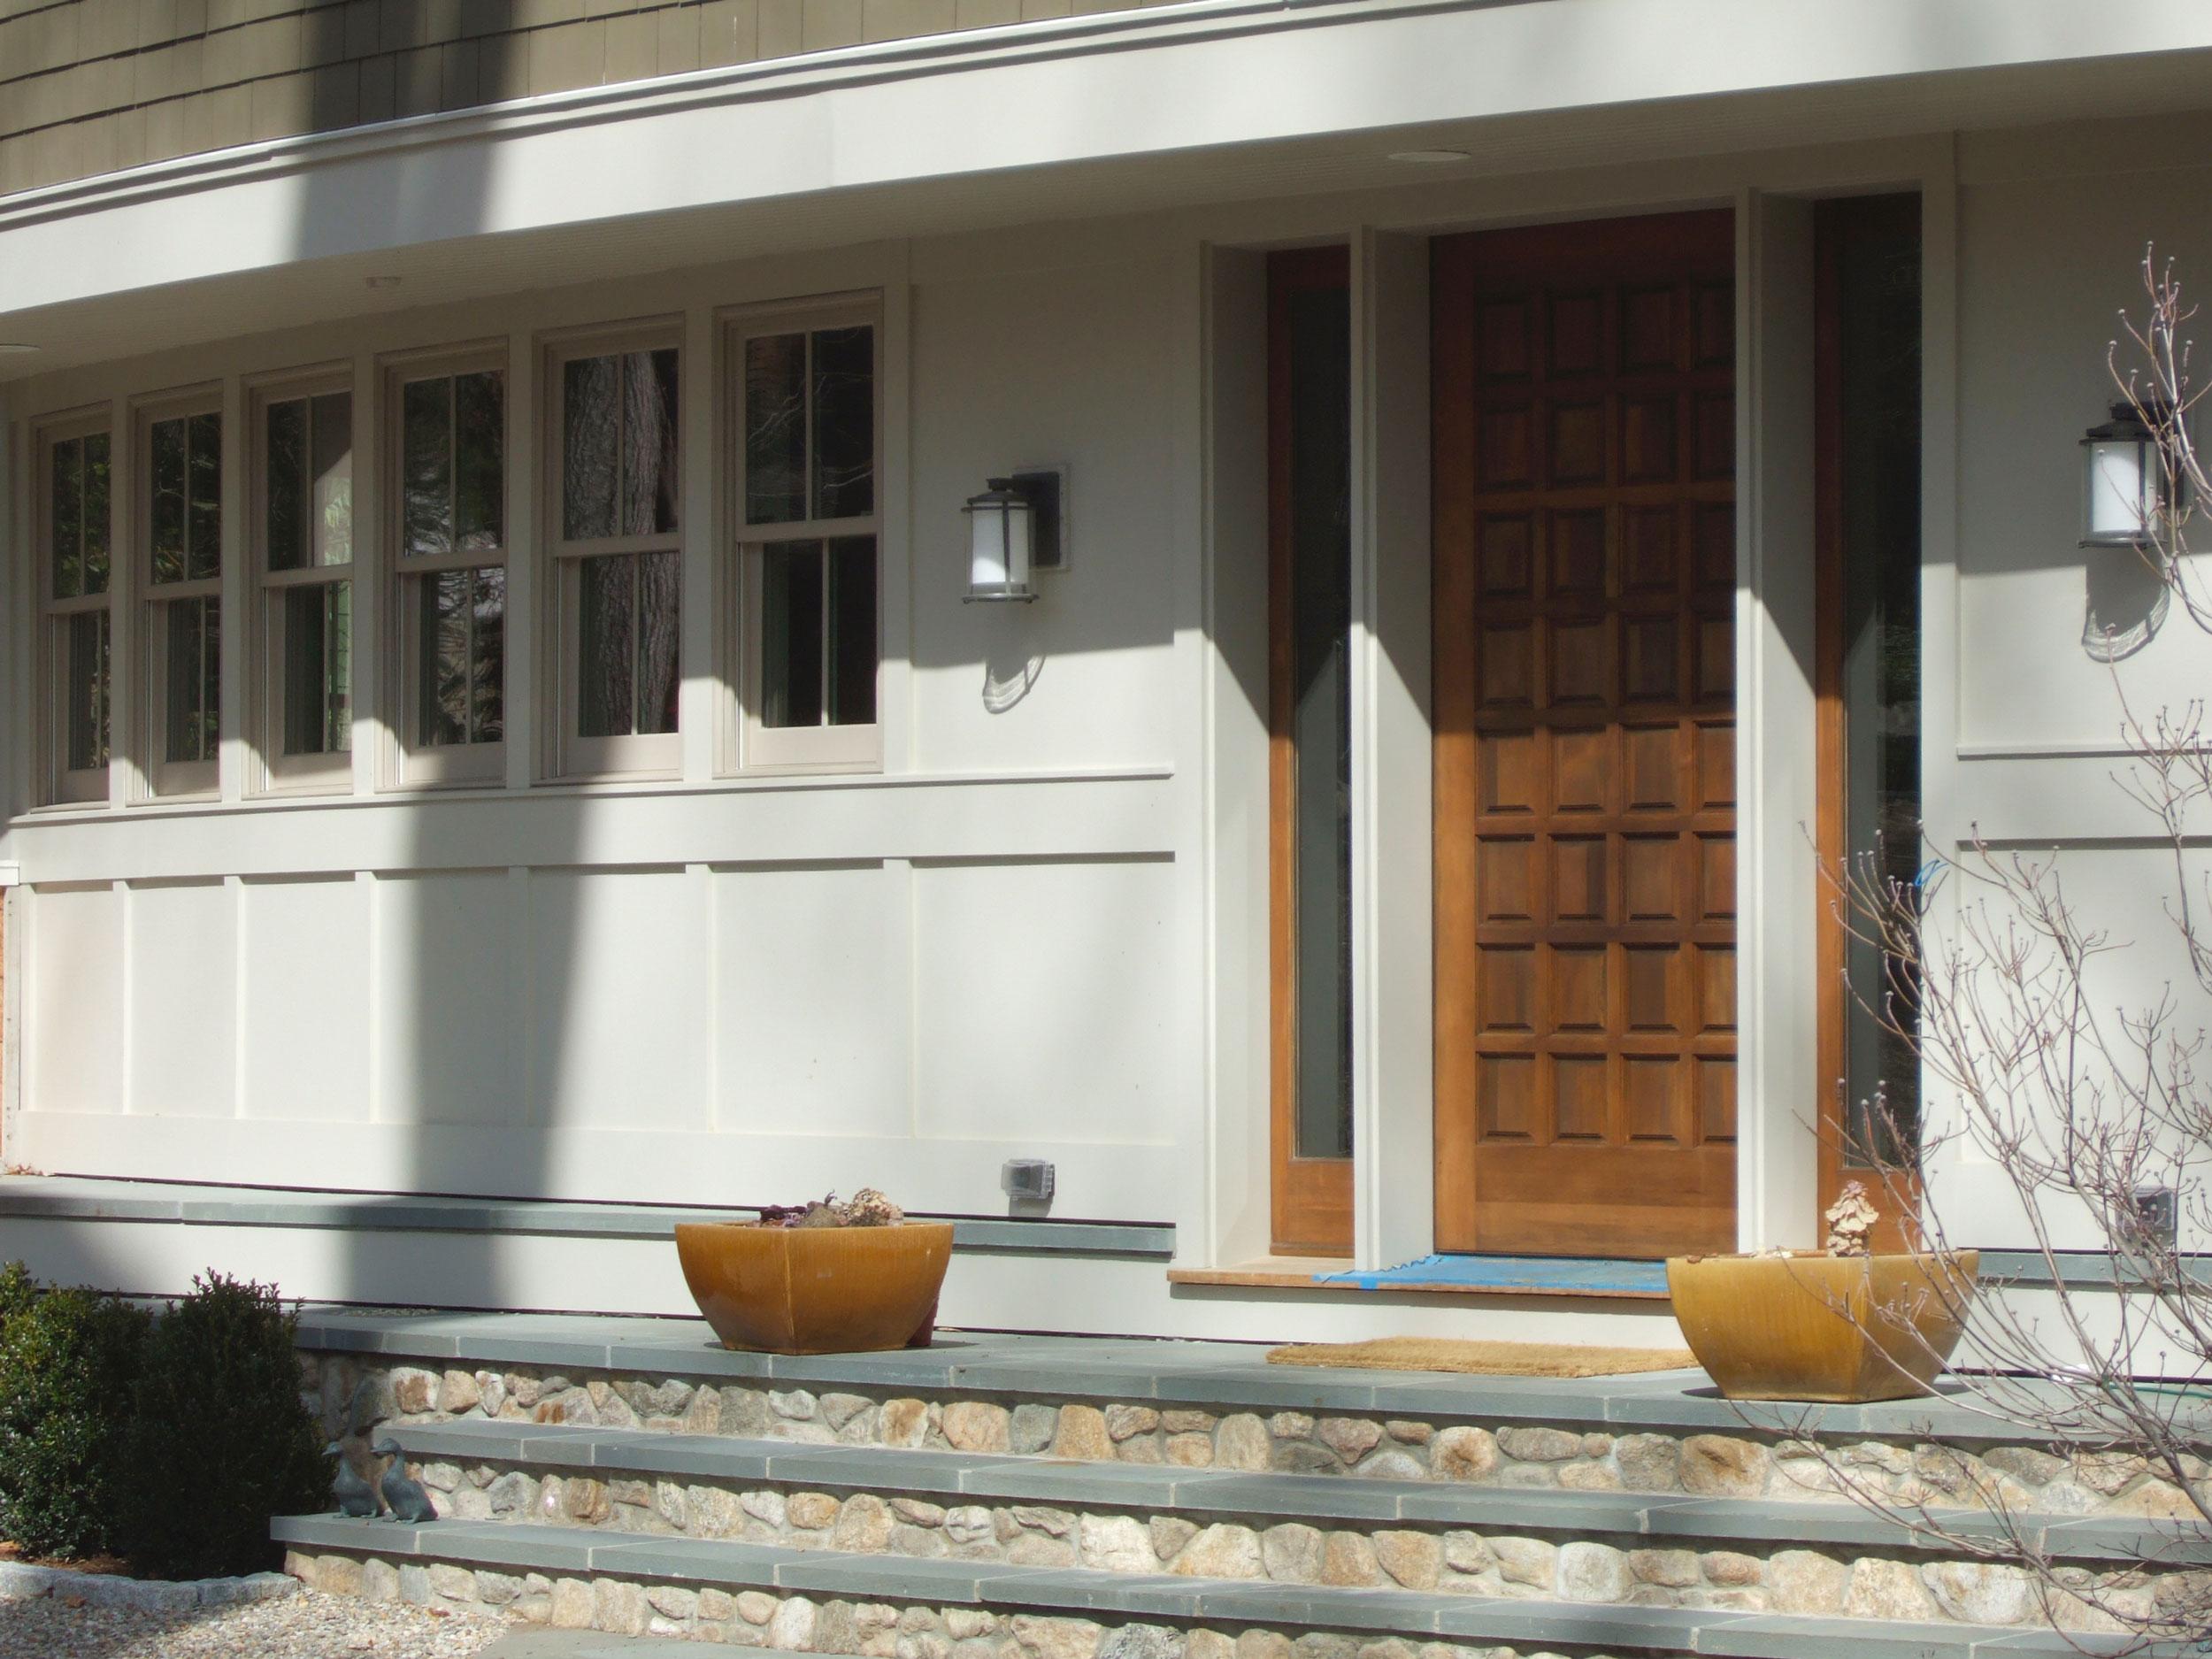 Rowayton-LEED-Gold-front-door.jpg